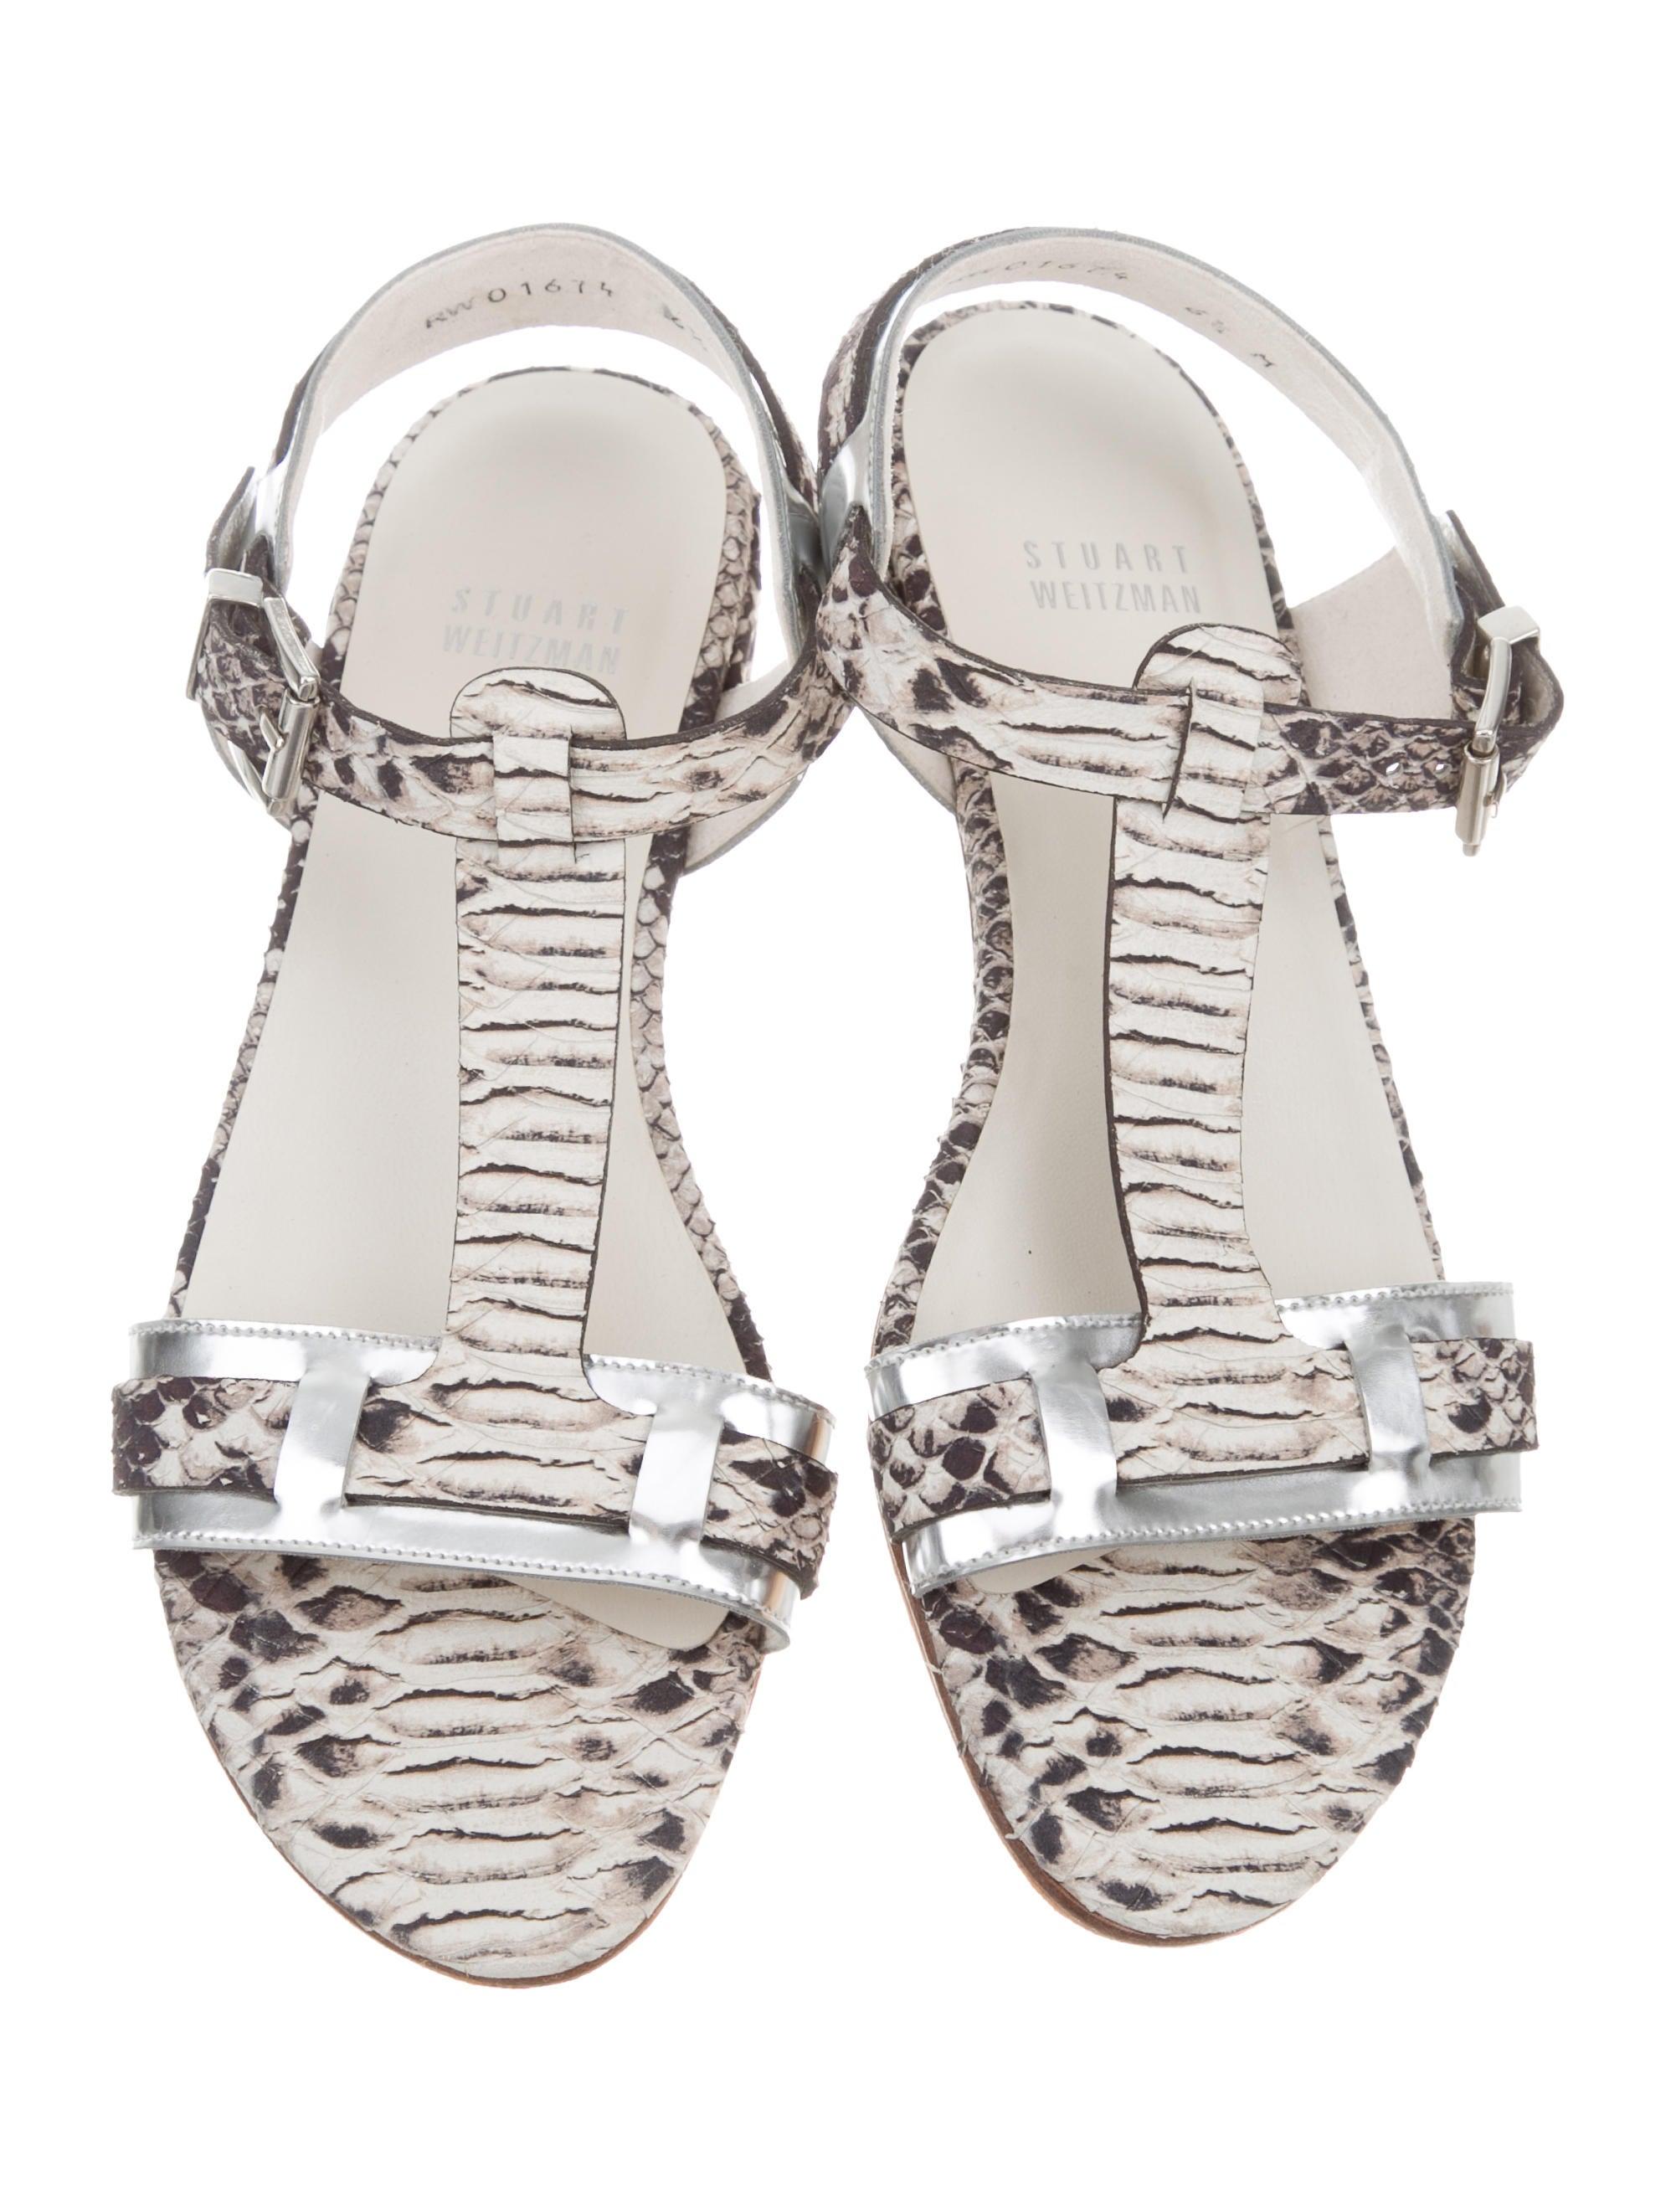 Stuart Weitzman Animal Print Metallic-Trimmed Sandals cheap buy authentic sale supply cheap outlet store s3Mum